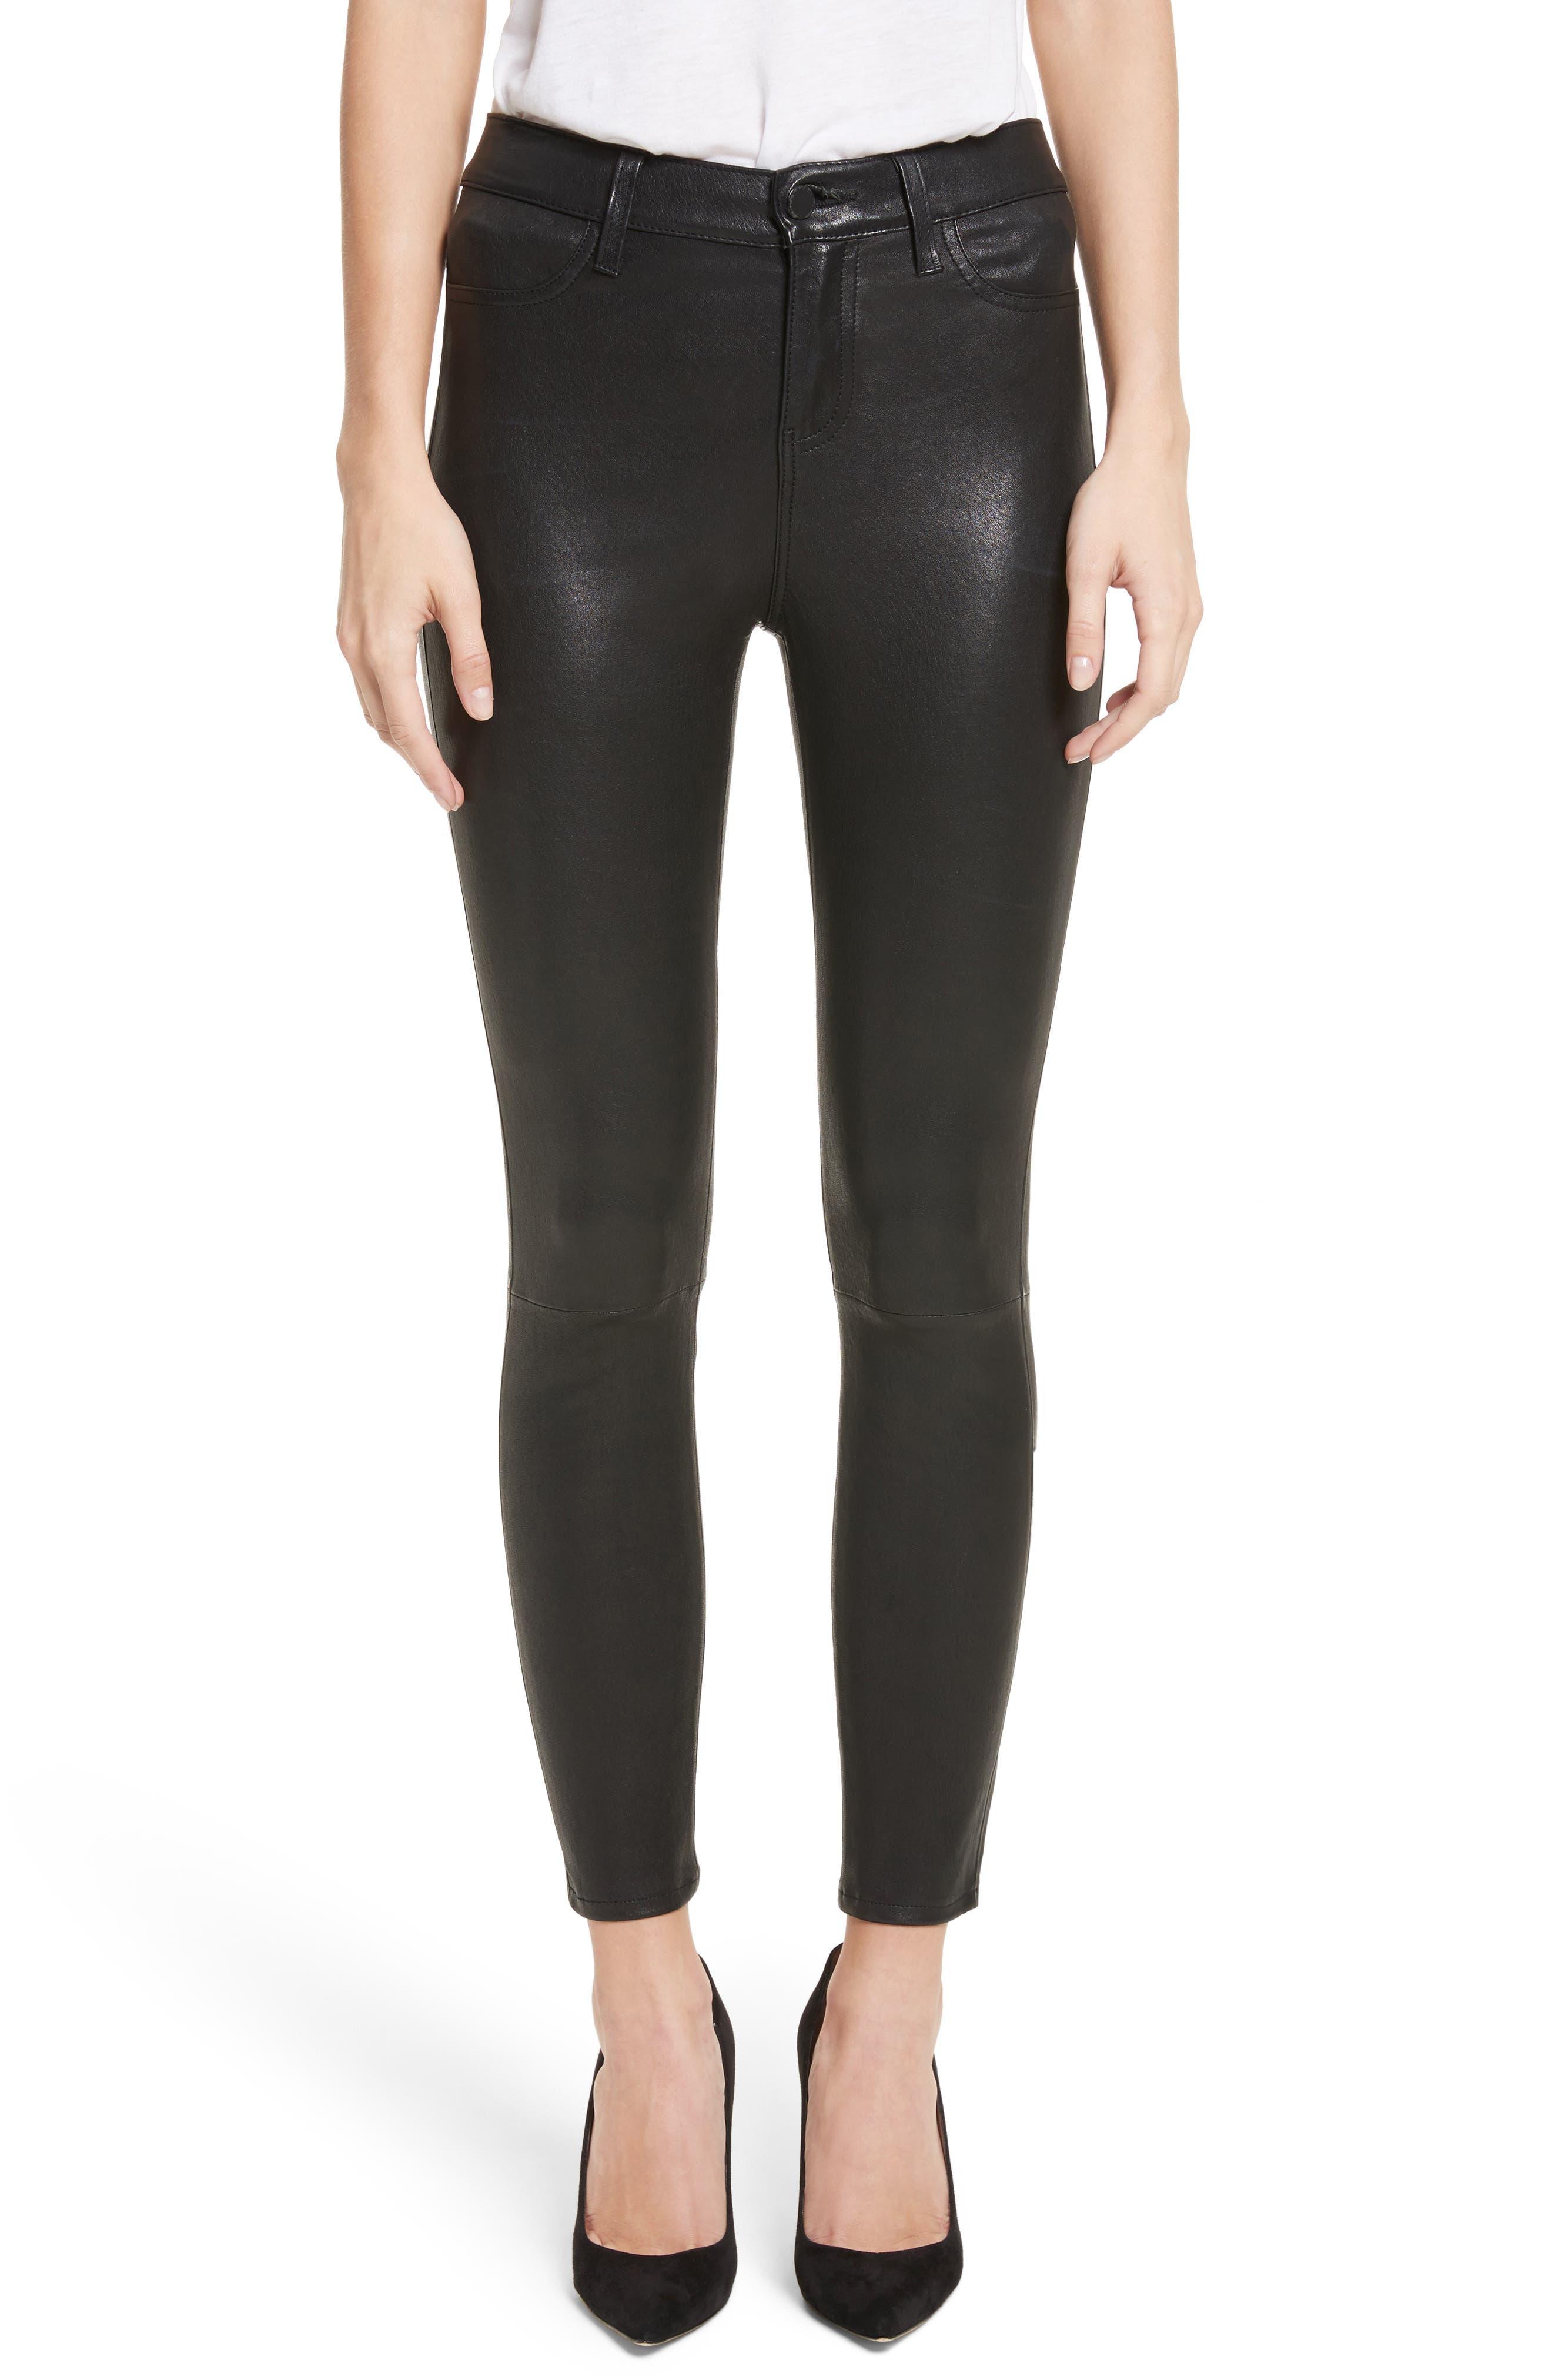 LAGENCE Adelaide High Waist Crop Leather Jeans,                             Main thumbnail 1, color,                             Noir